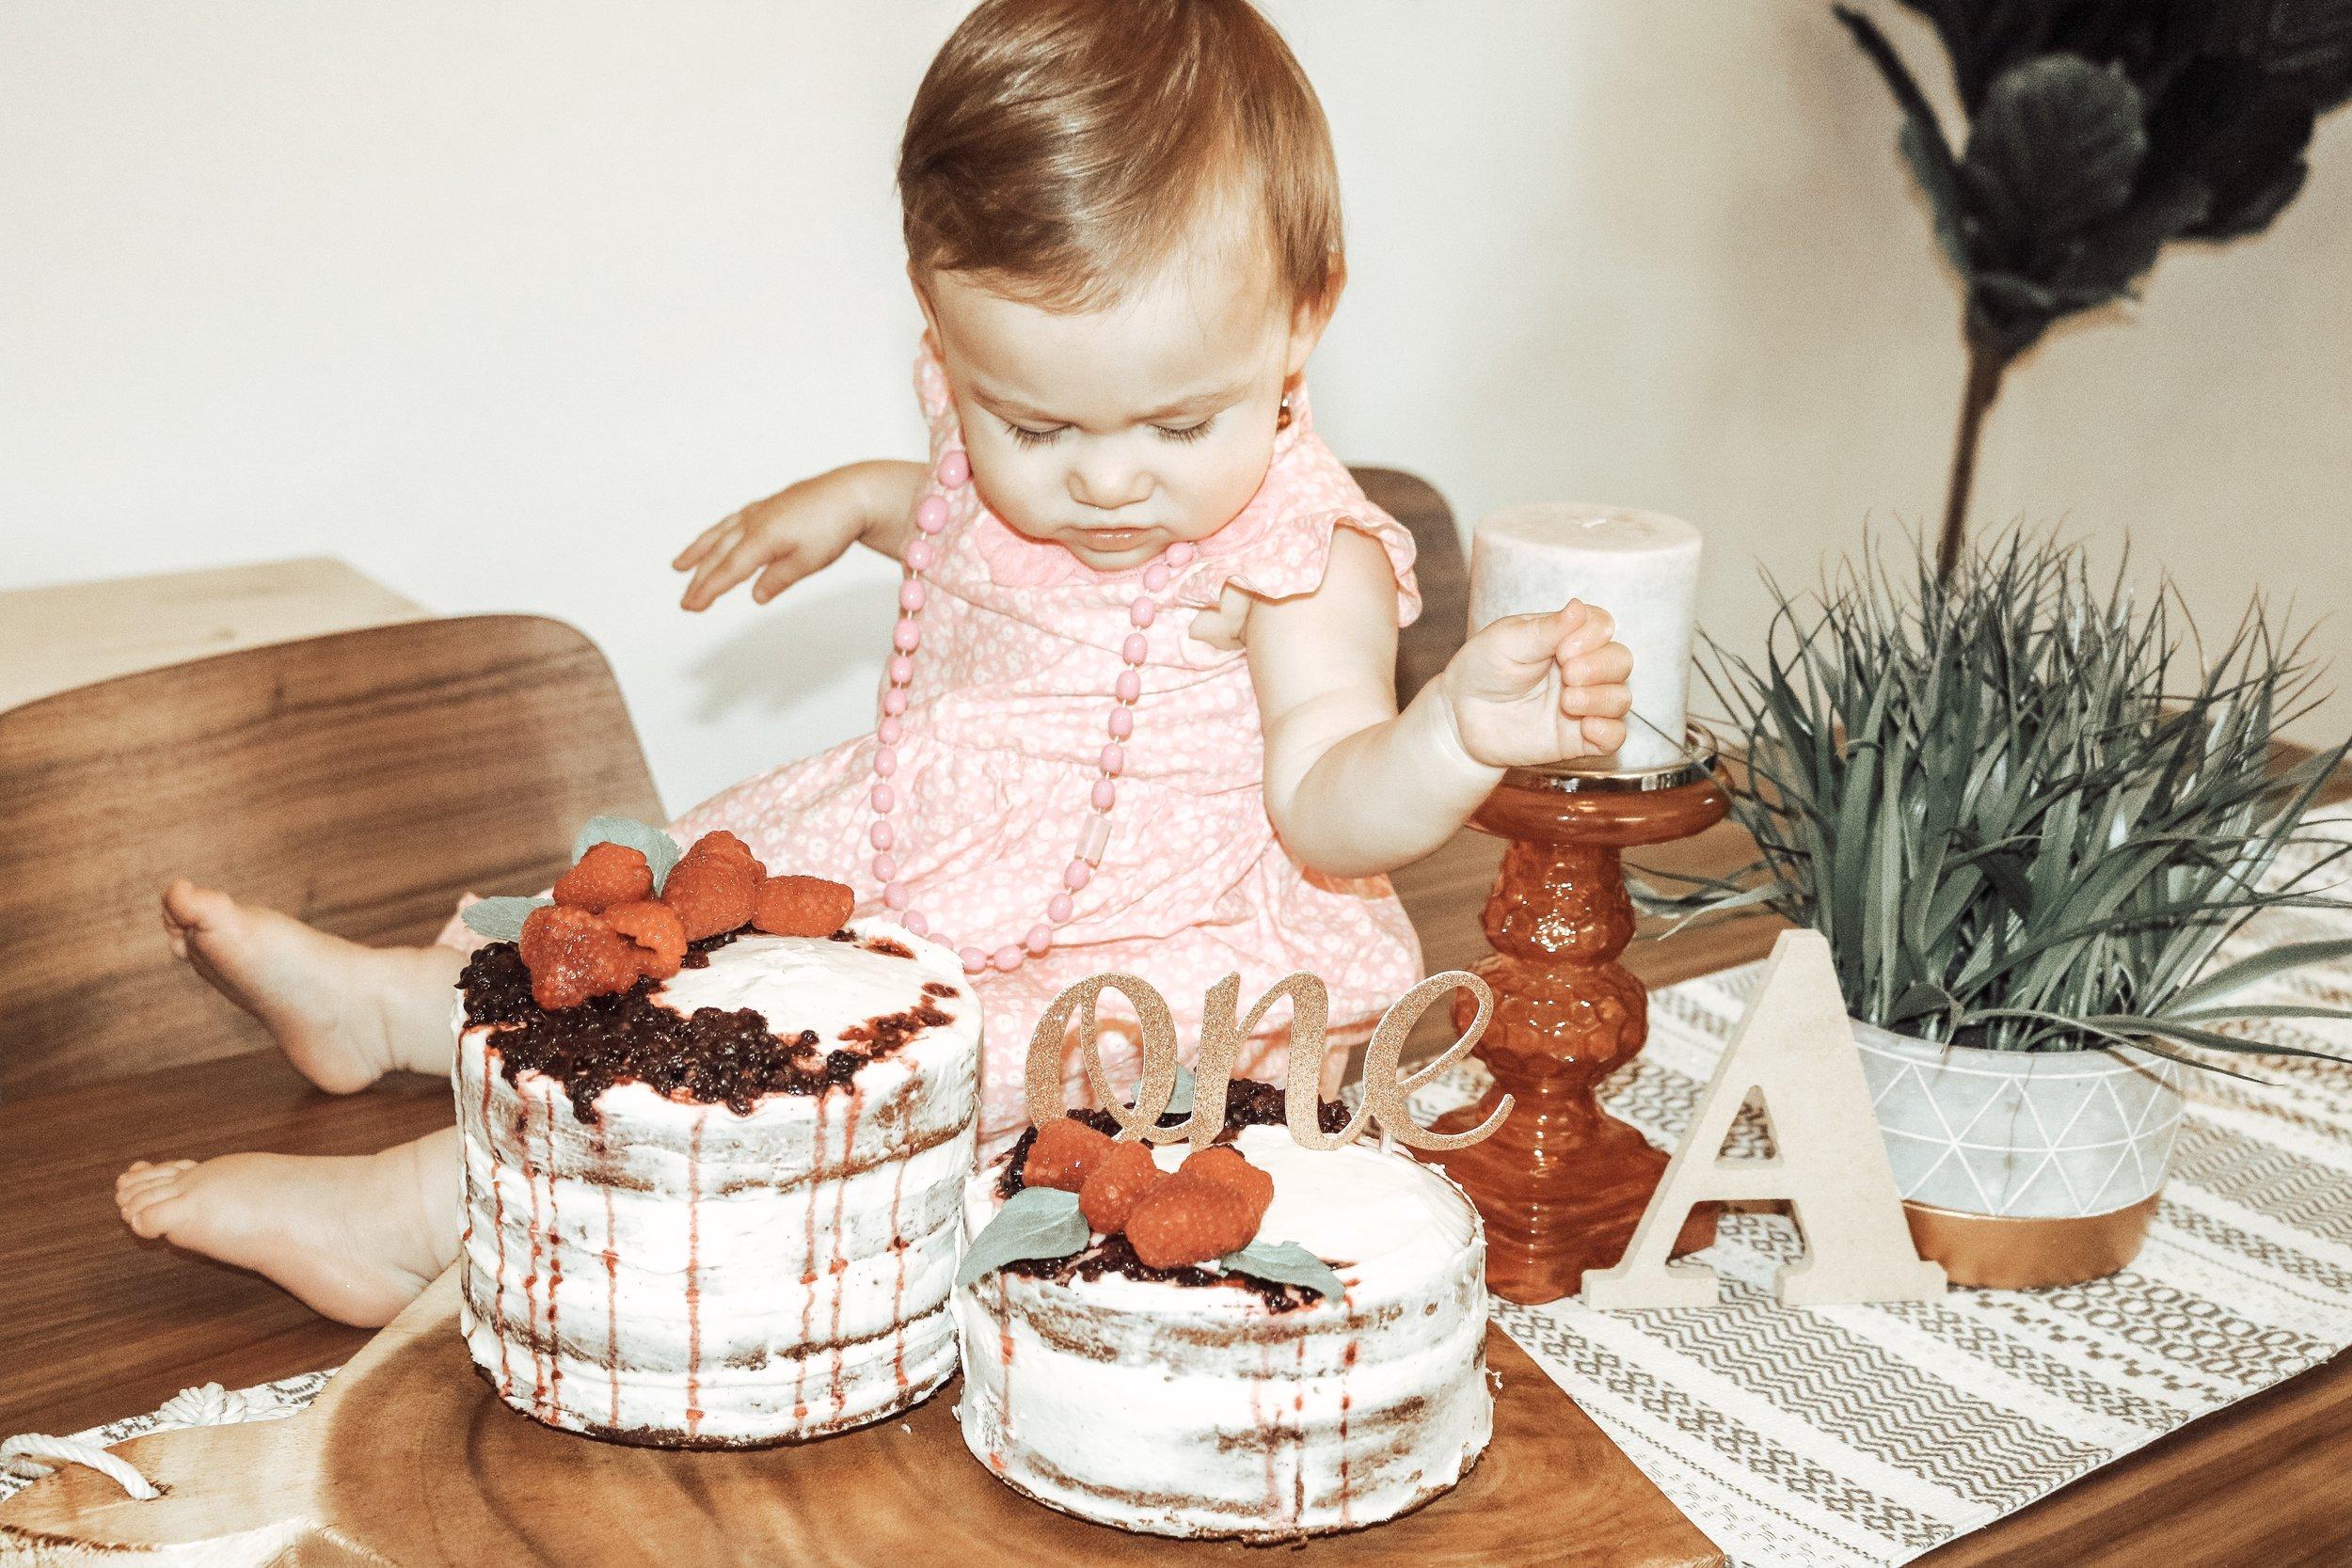 cake pose 4.jpg